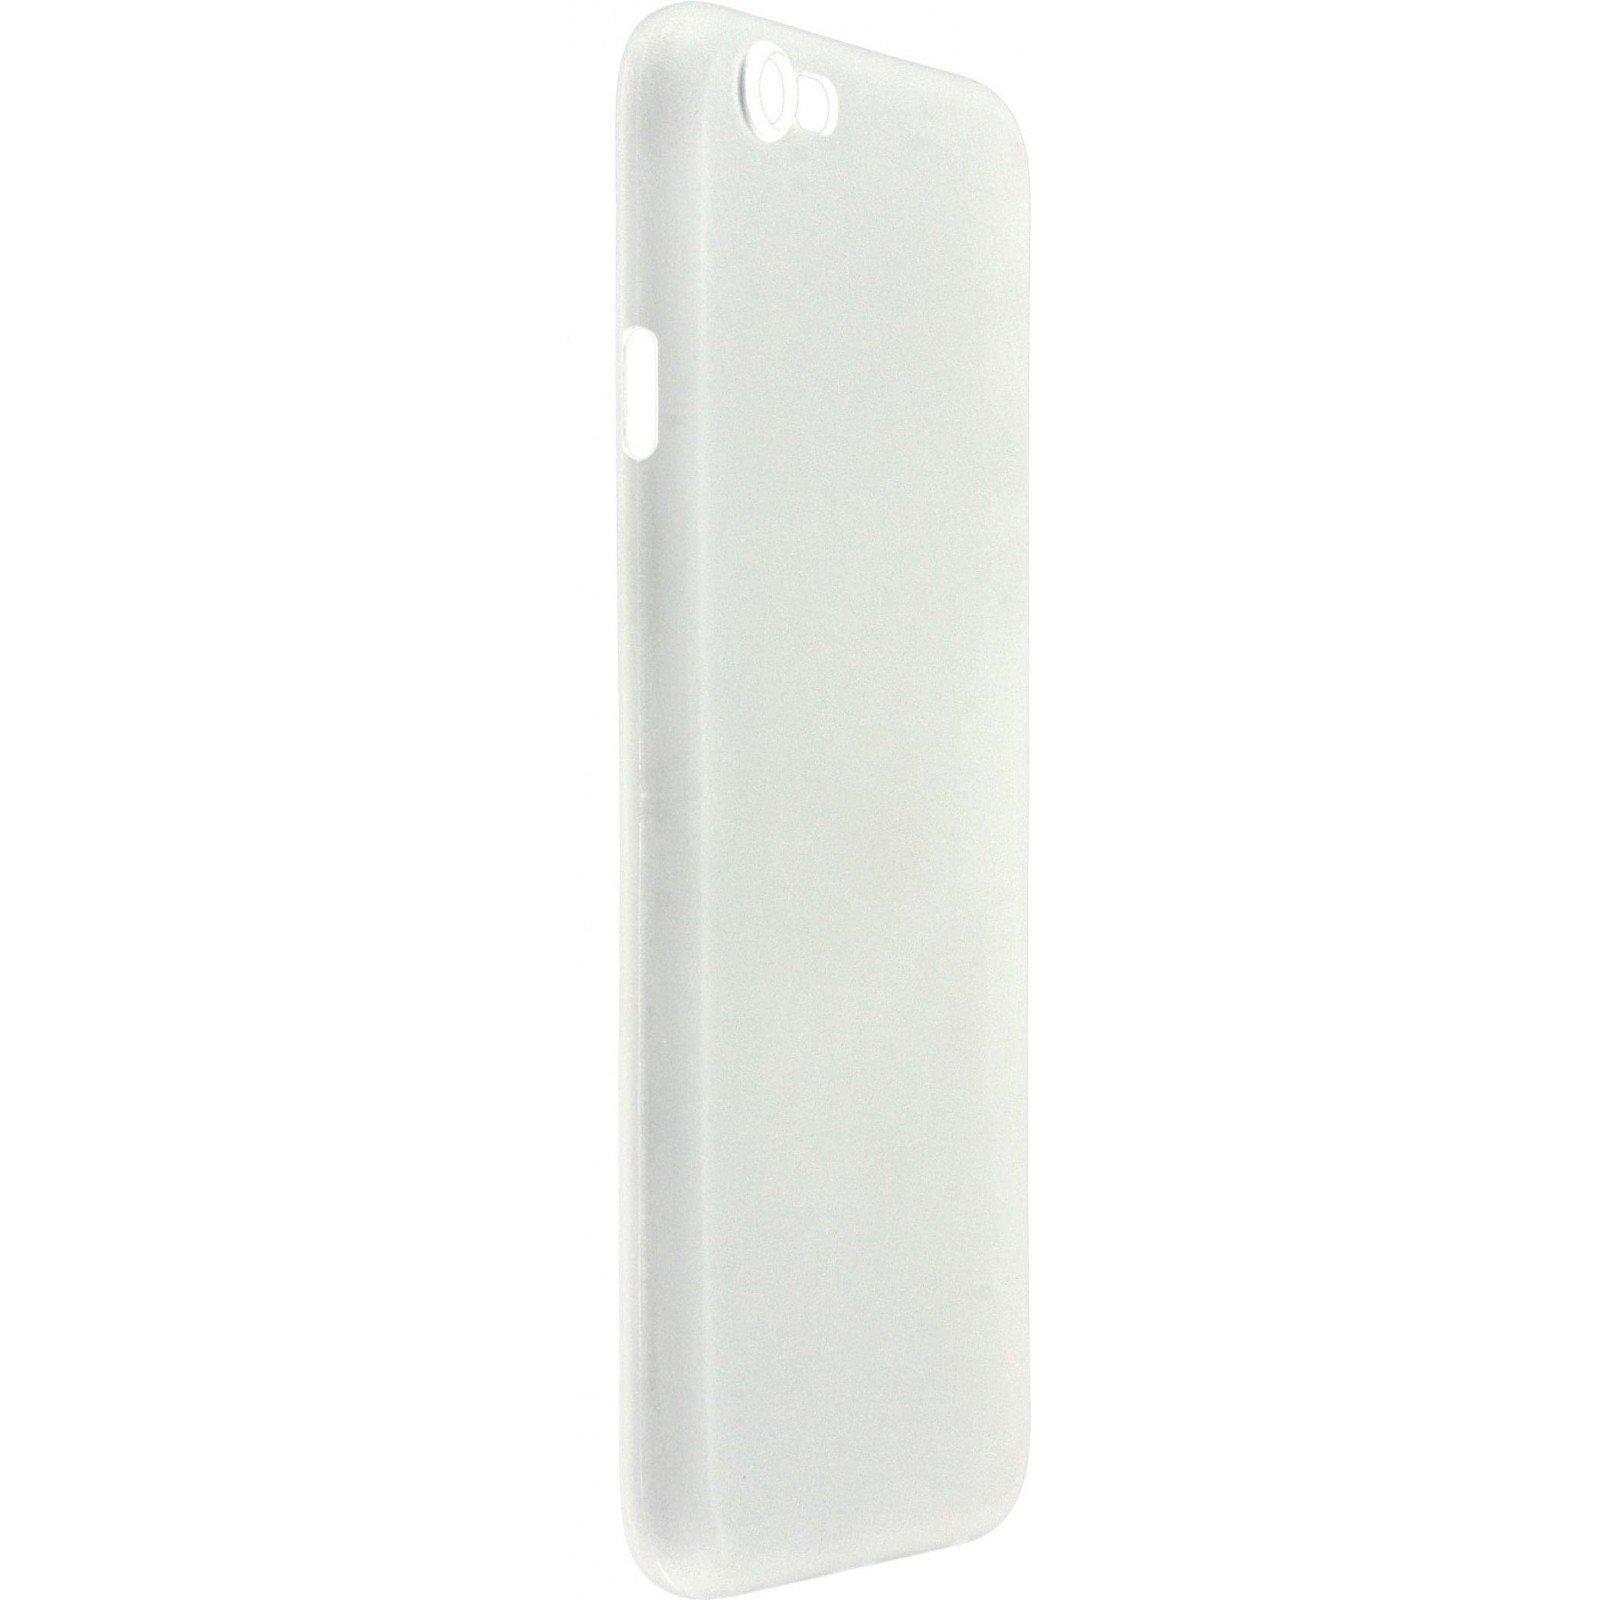 Чехол для моб. телефона MakeFuture Ice Case (PP) для Apple iPhone 6 White (MCI-AI6WH) изображение 2